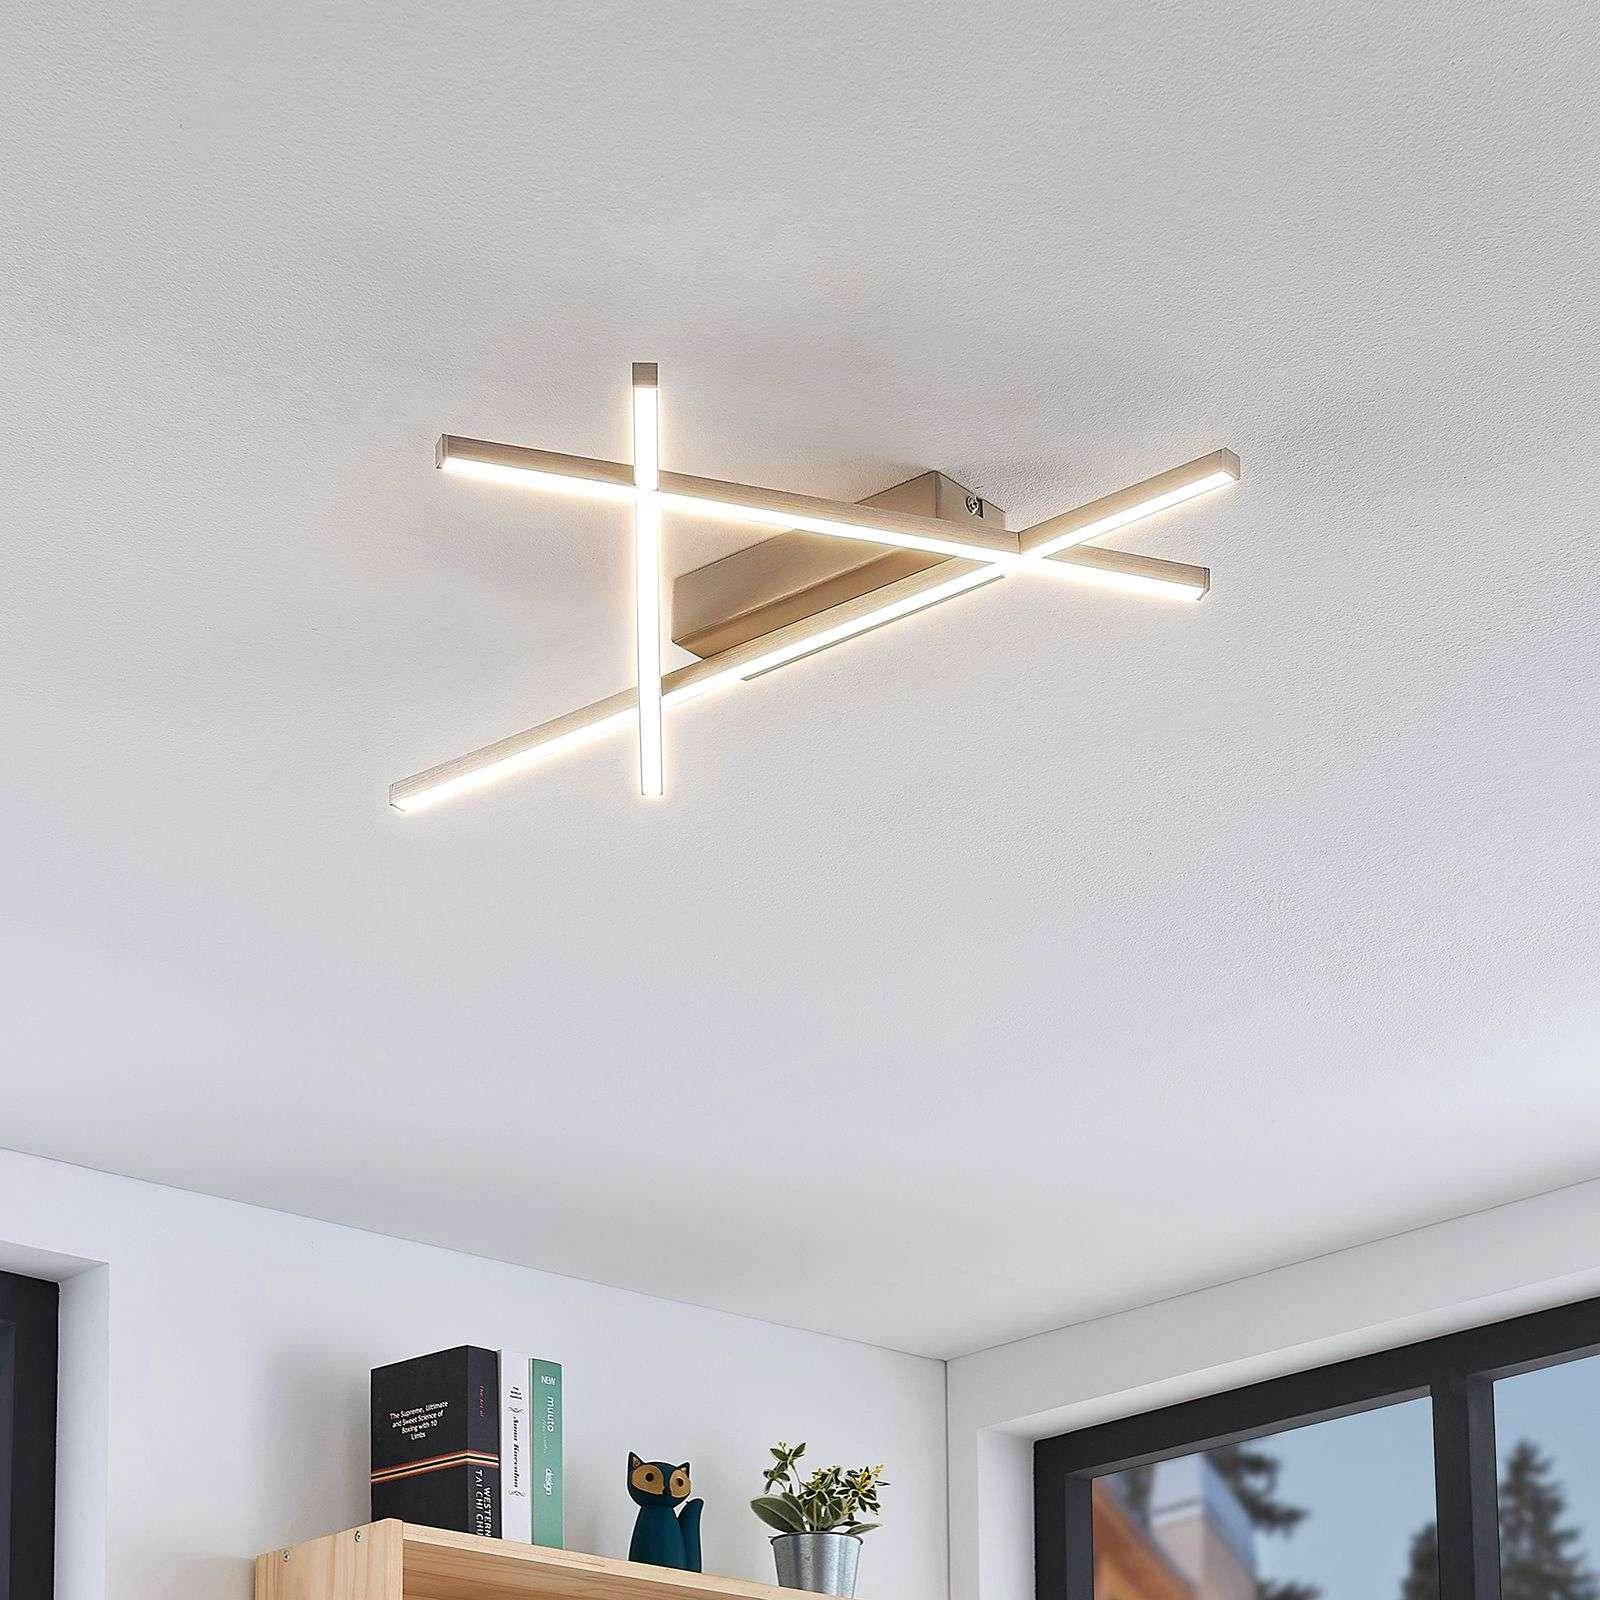 futuristic lighting. Futuristic Mikada LED Ceiling Light 57 X 33.5cm-7620018-31 Lighting